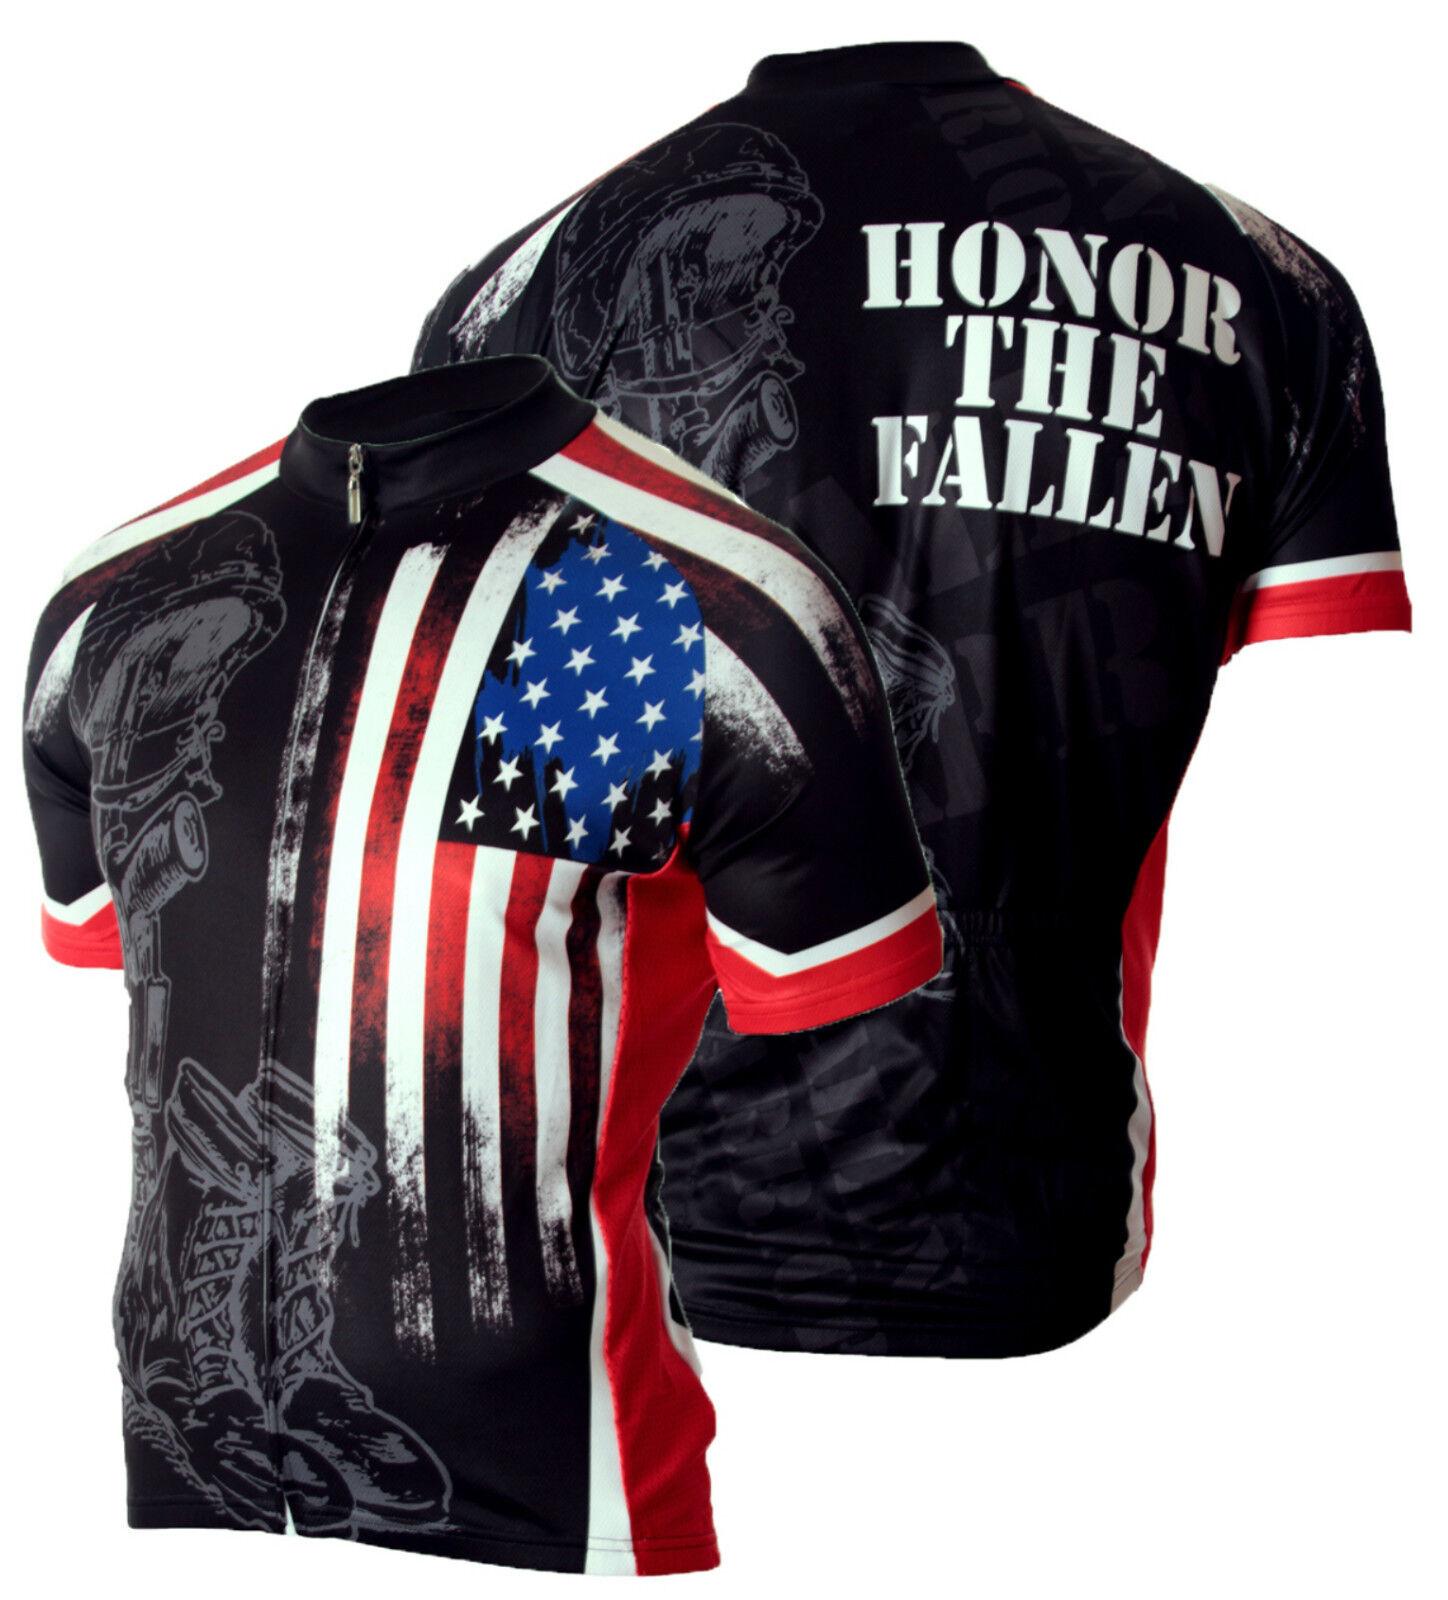 Military Fallen Warrior Mens Cycling Jersey Bike 83 Sportswear USMC Army Navy